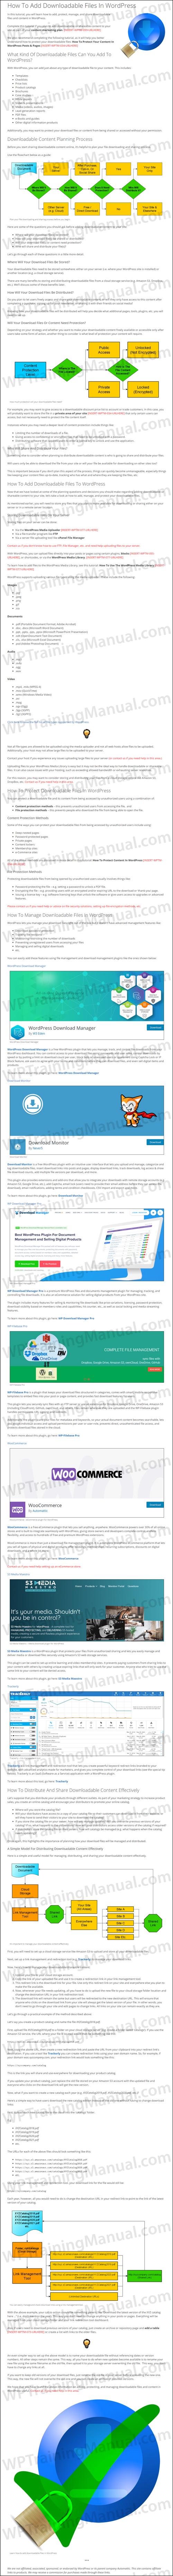 White Label Tutorial: How To Add Downloadable Files In WordPress - WPTrainingManual.com